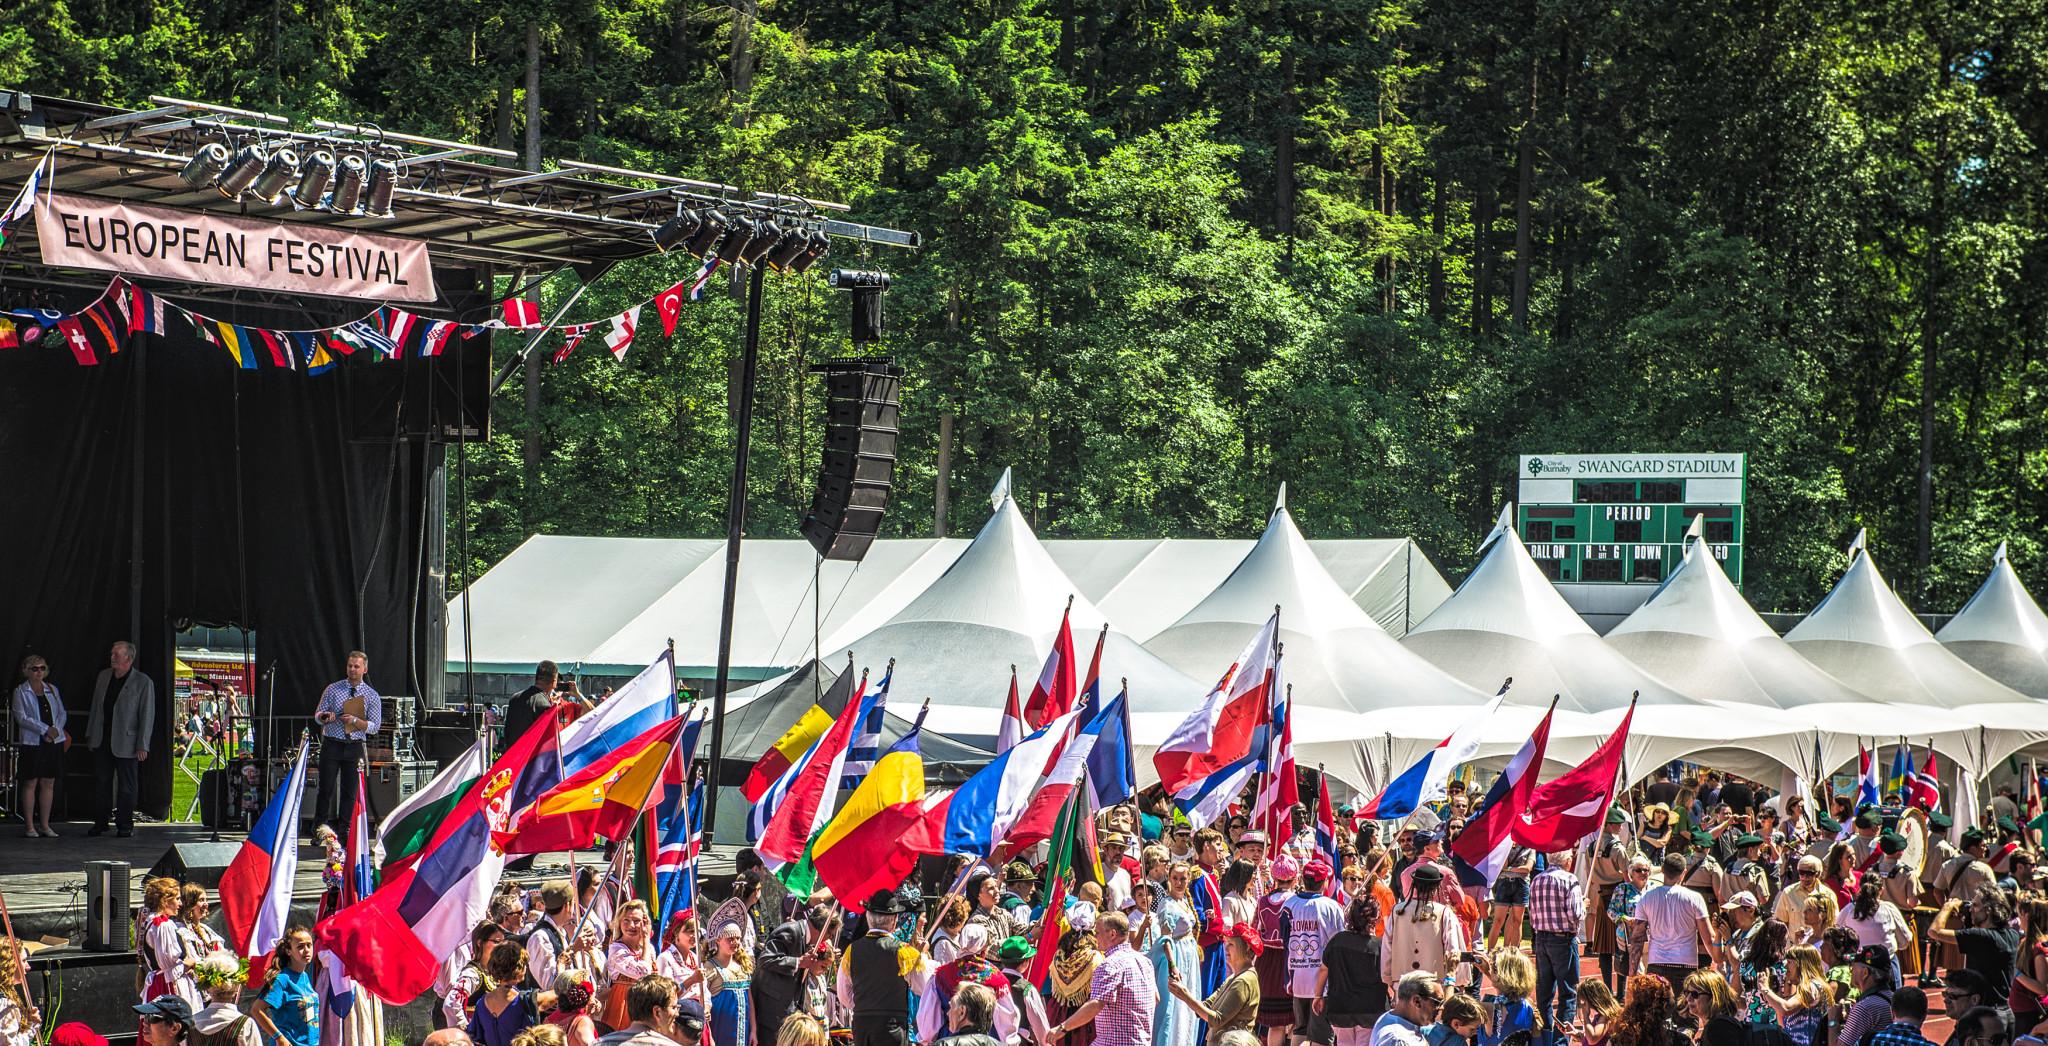 Image: European Festival